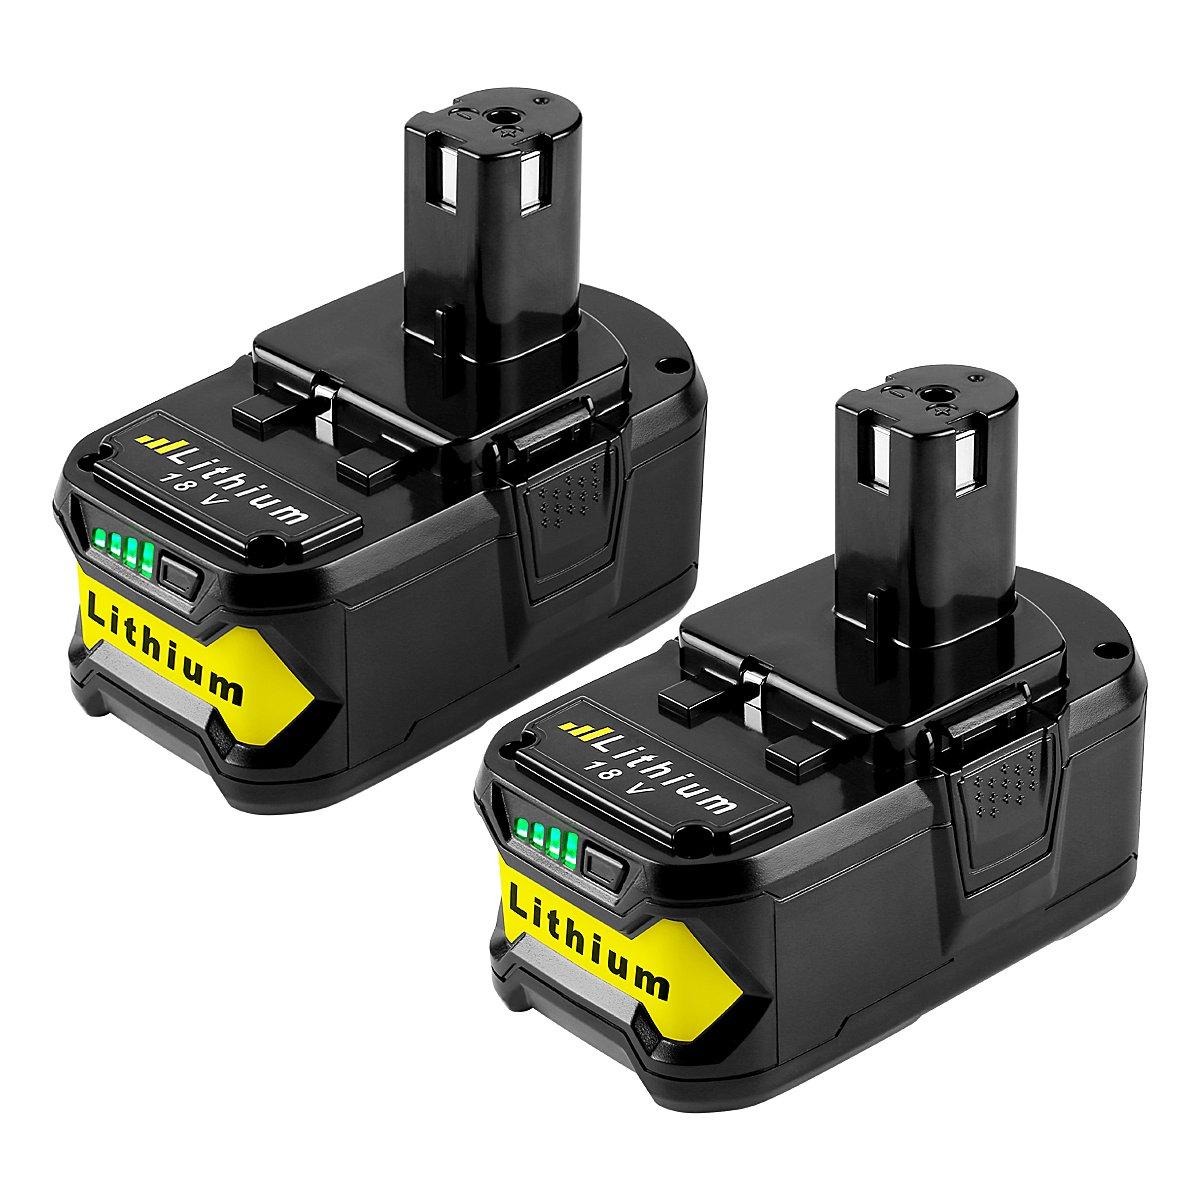 Energup 2Pack 5.0Ah 18V Replacement Battery for Ryobi 18V Lithium Battery P102 P103 P105 P107 P108 P109 Ryobi ONE+ Cordless Tool